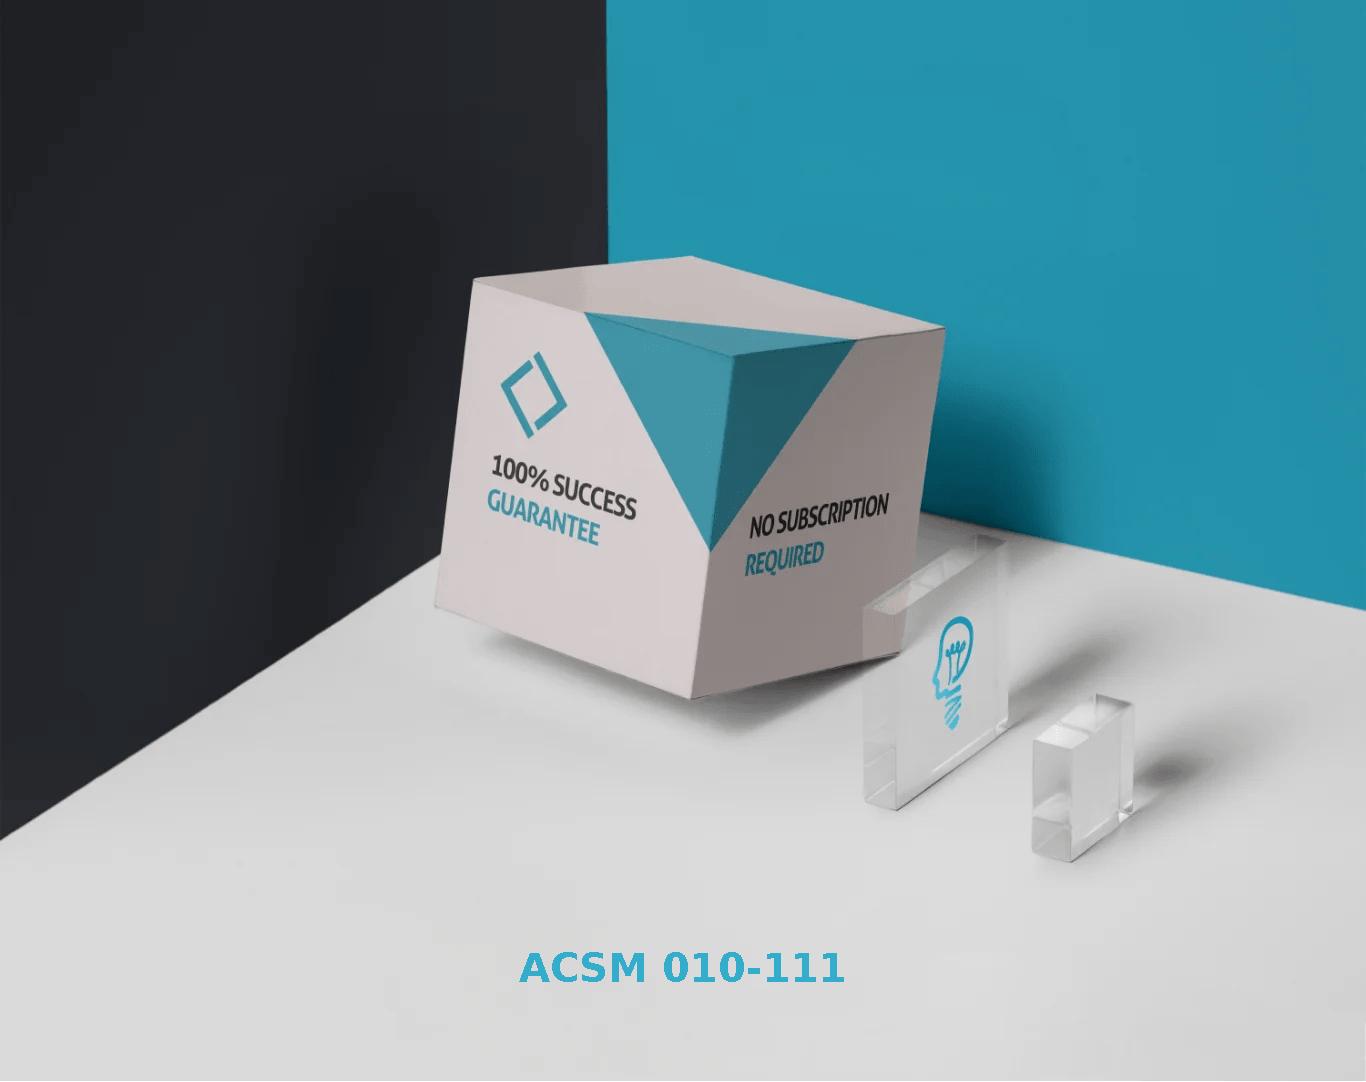 ACSM 010-111 Exams